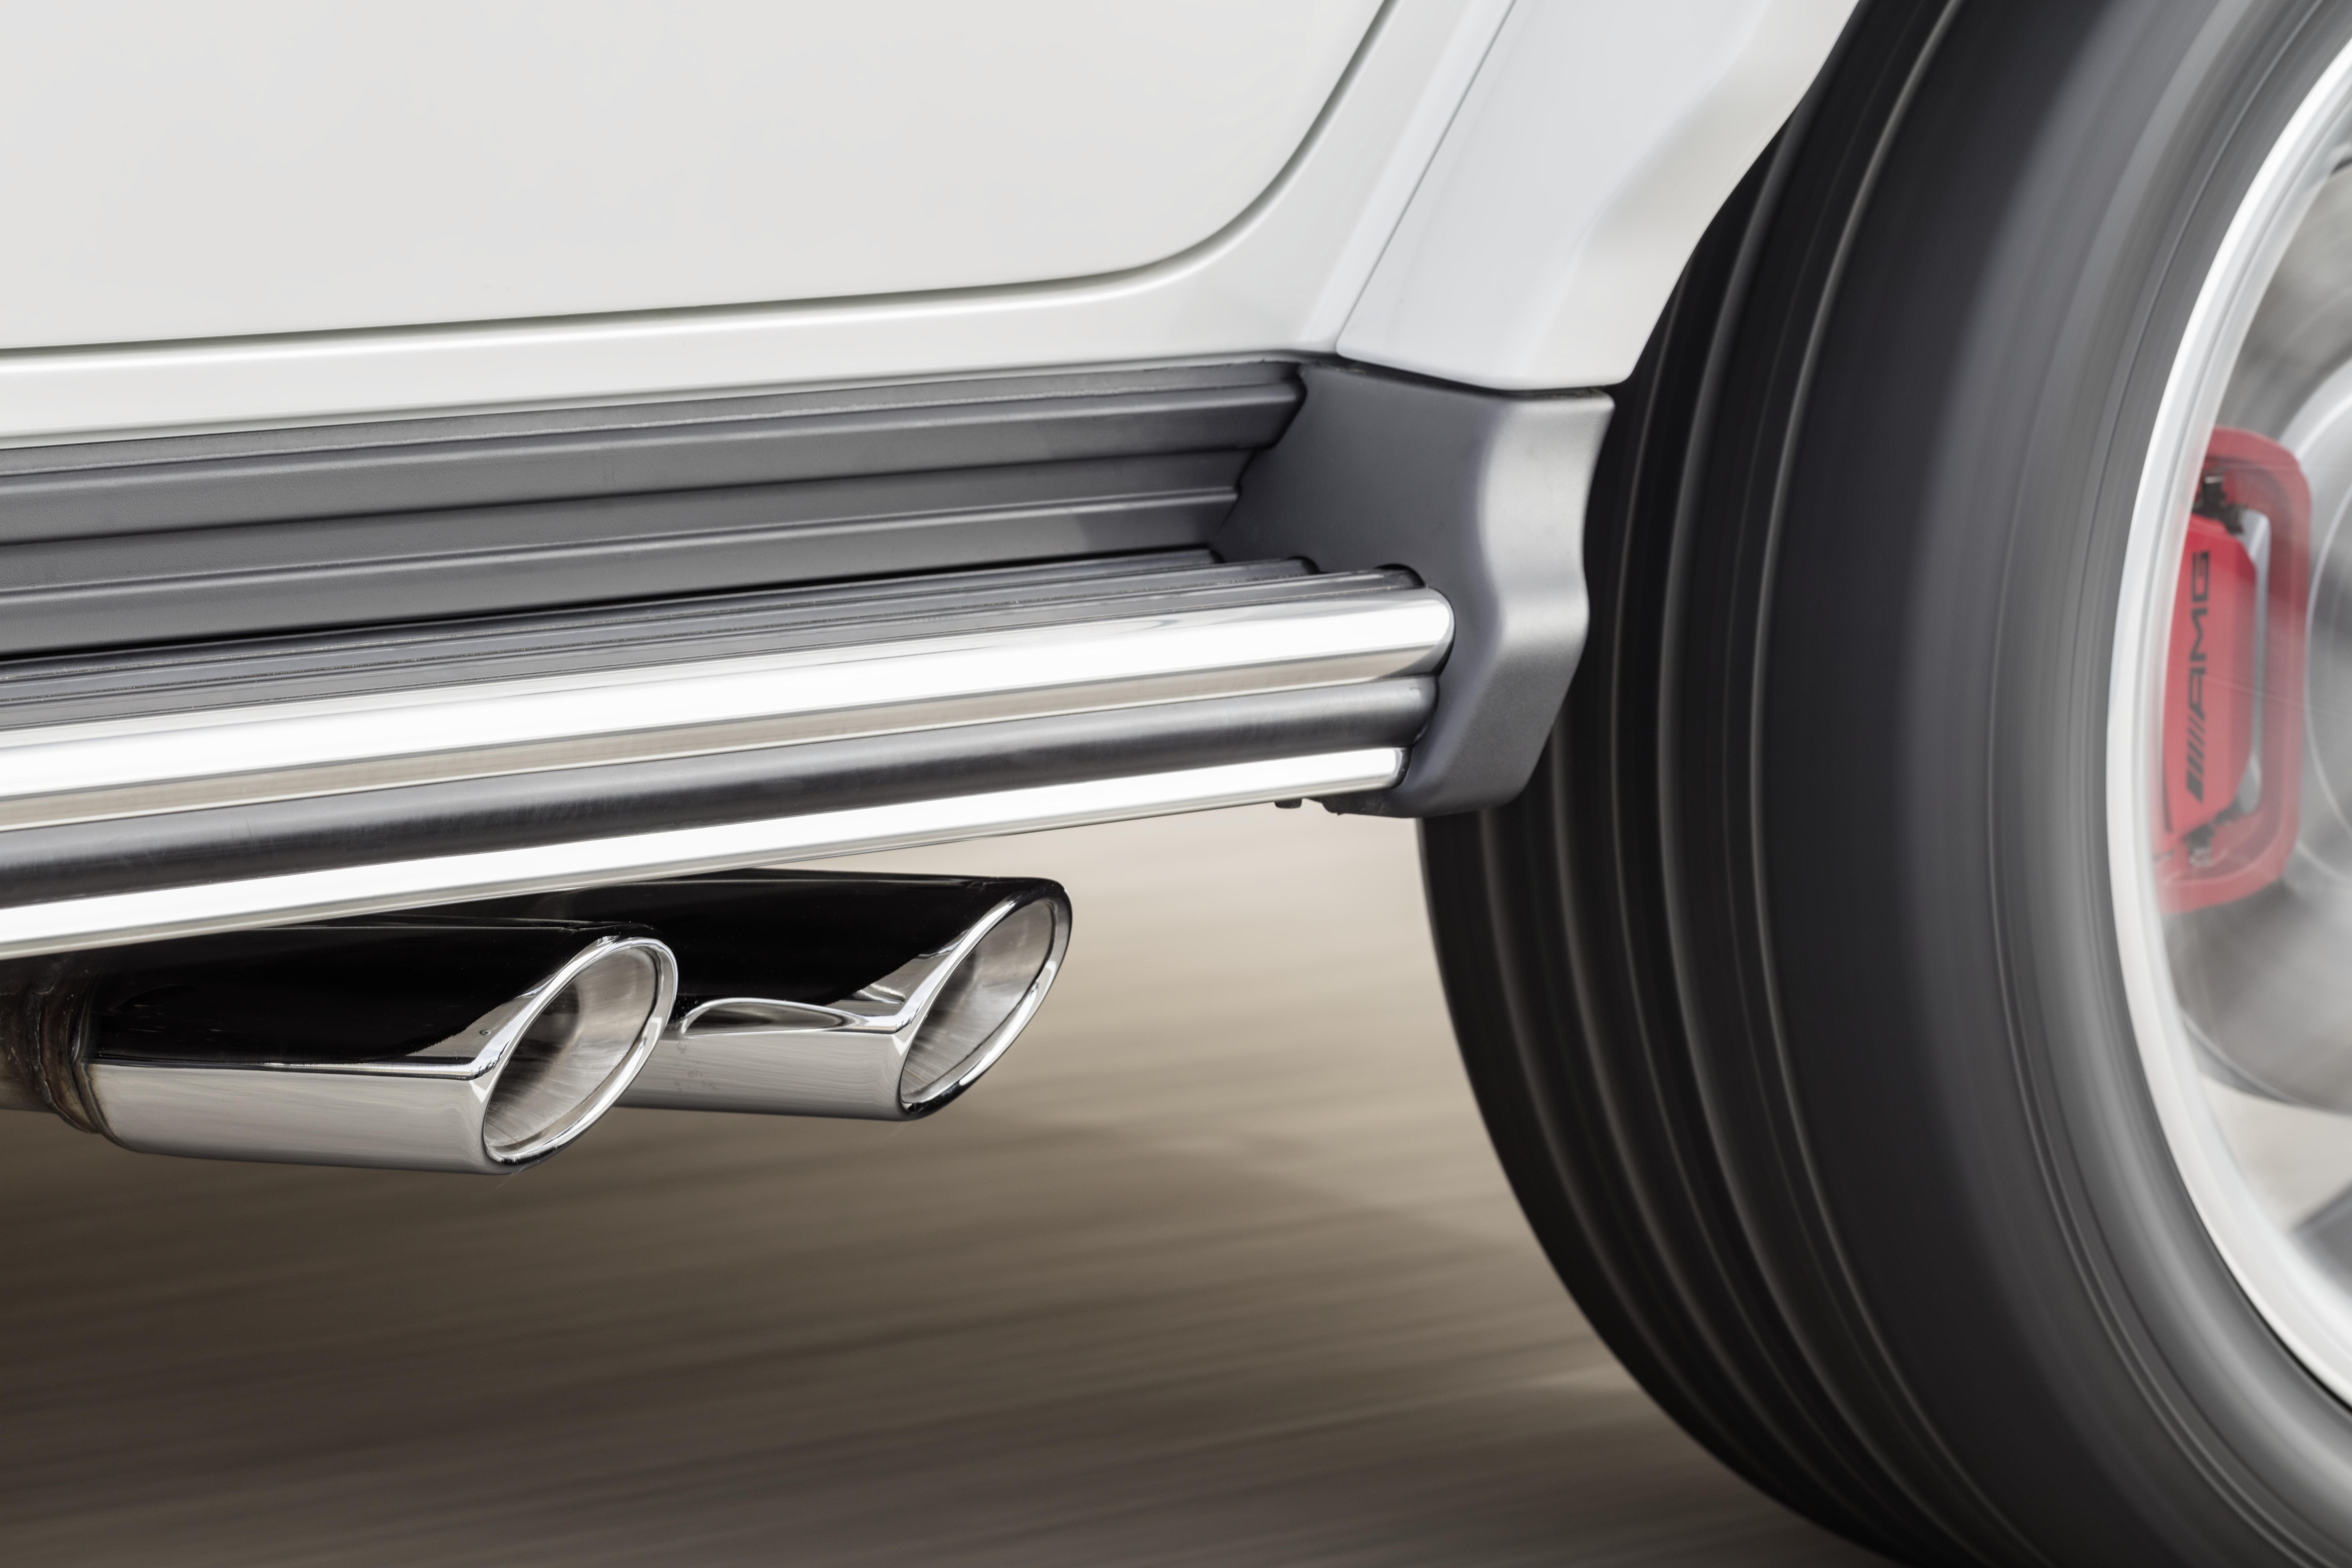 2018 Mercedes-Benz AMG G 63